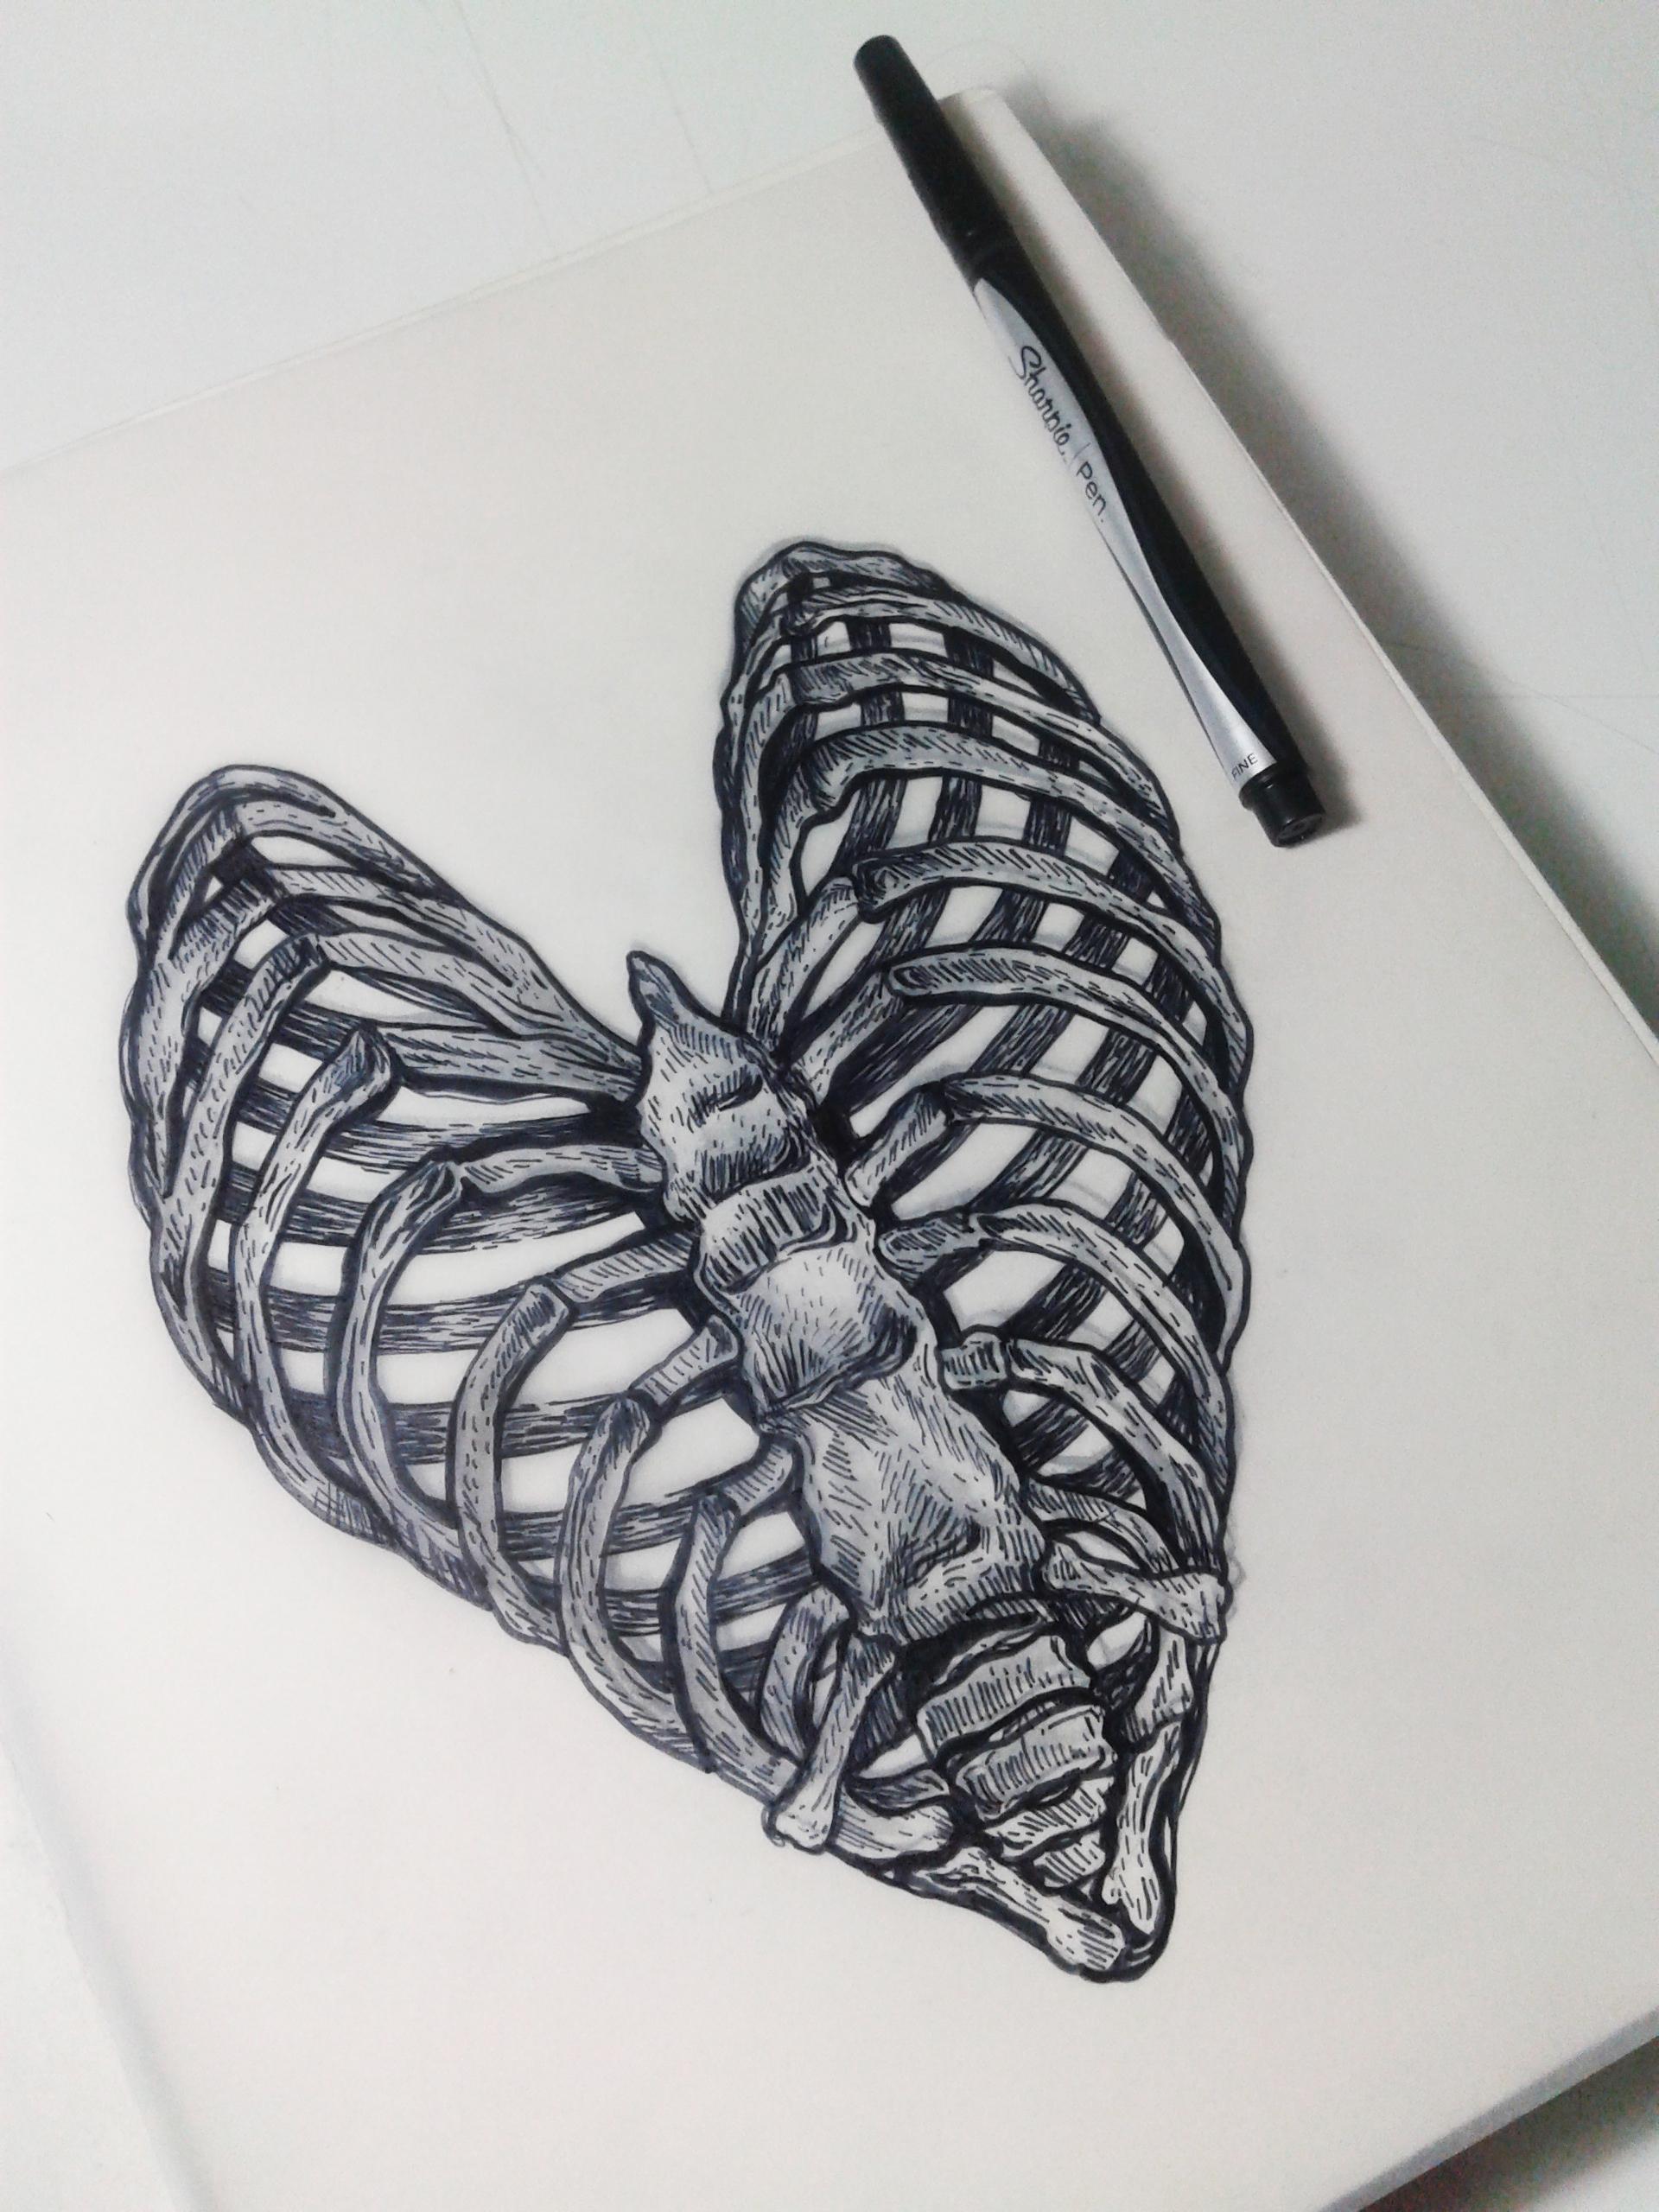 Skeleton Drawings Tumblr